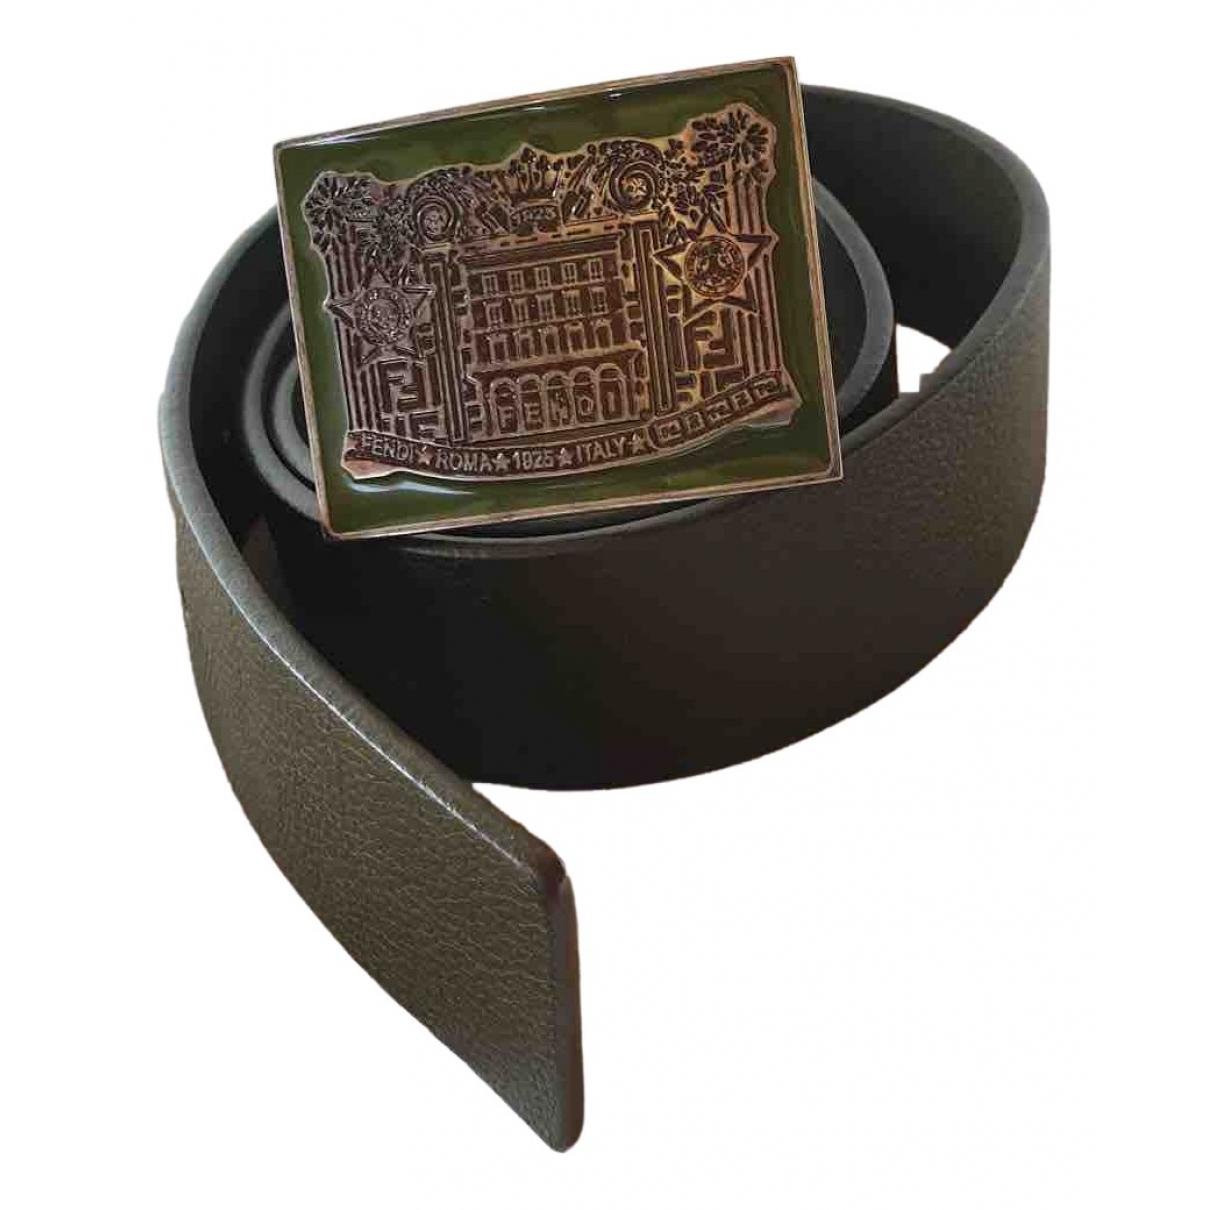 Fendi \N Green Leather belt for Men L international